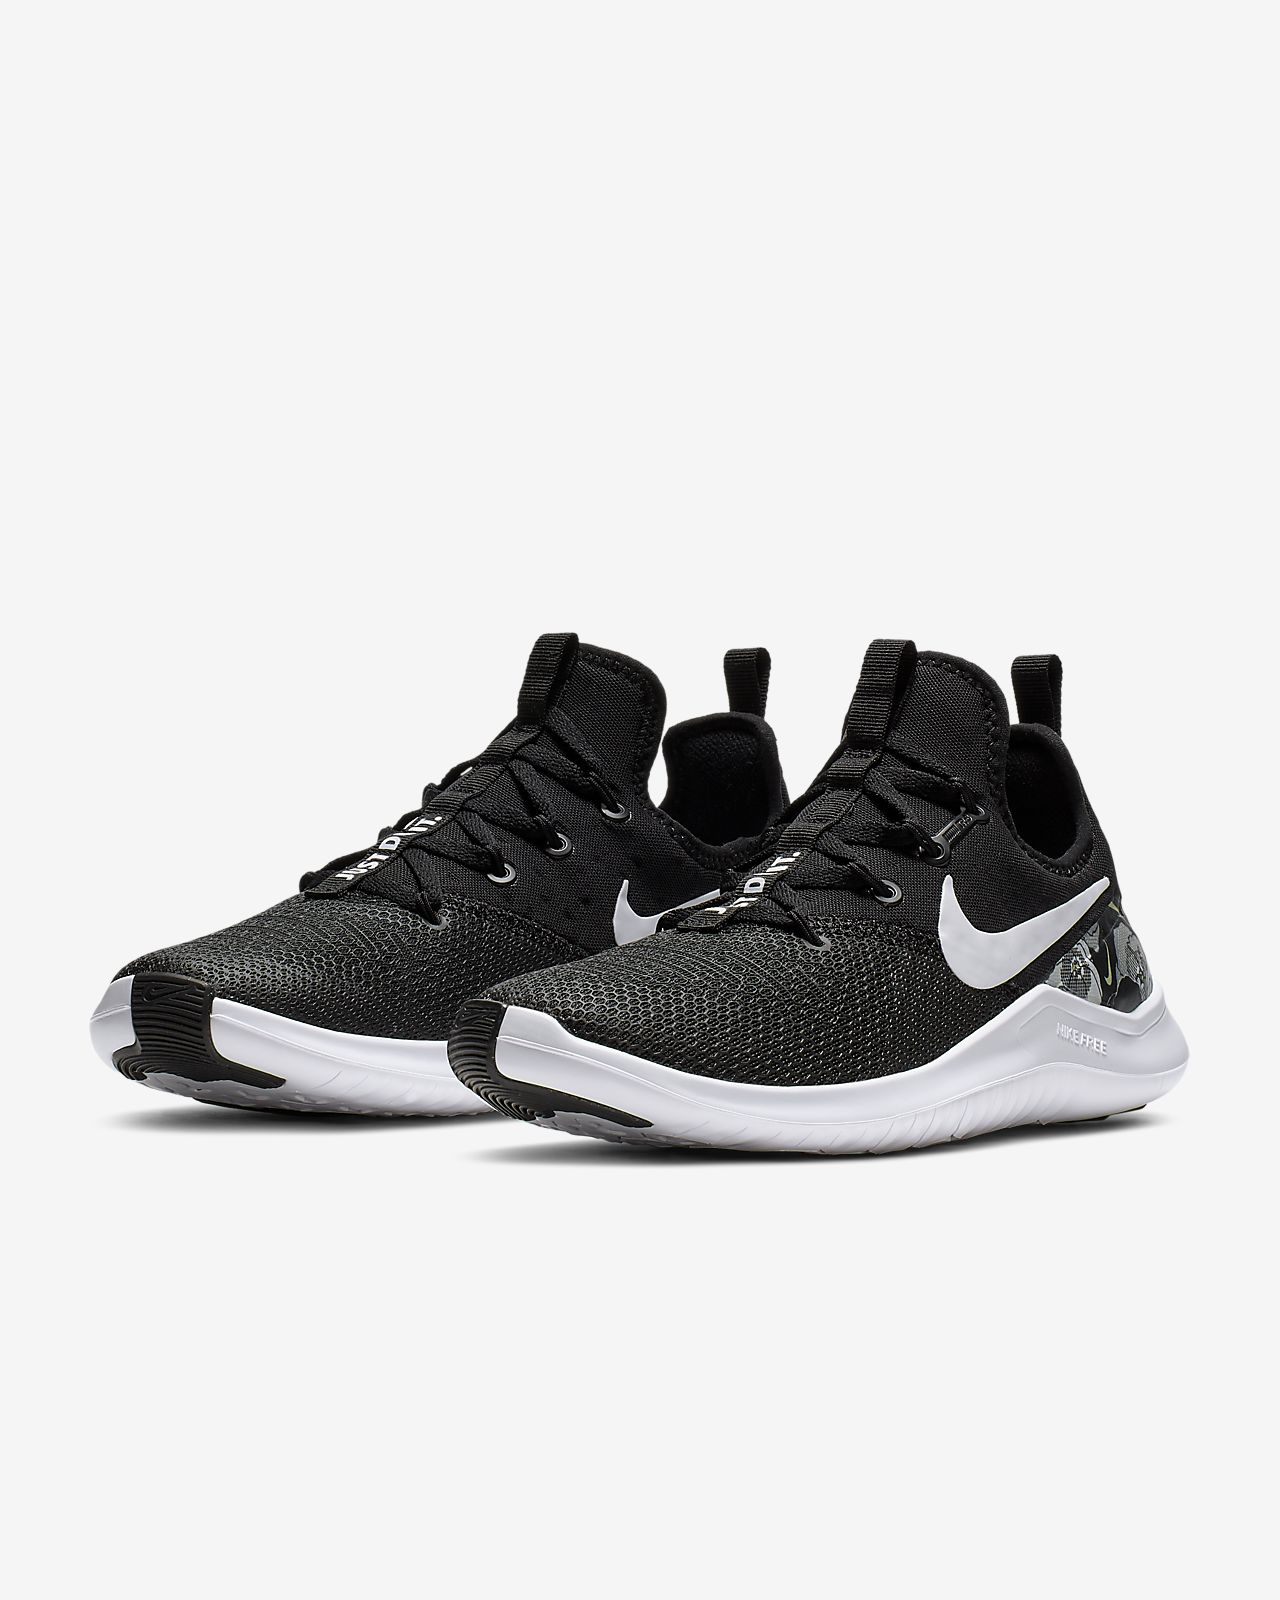 size 40 2a5e0 df78c ... Nike Free TR 8 AMP Women s Training Shoe